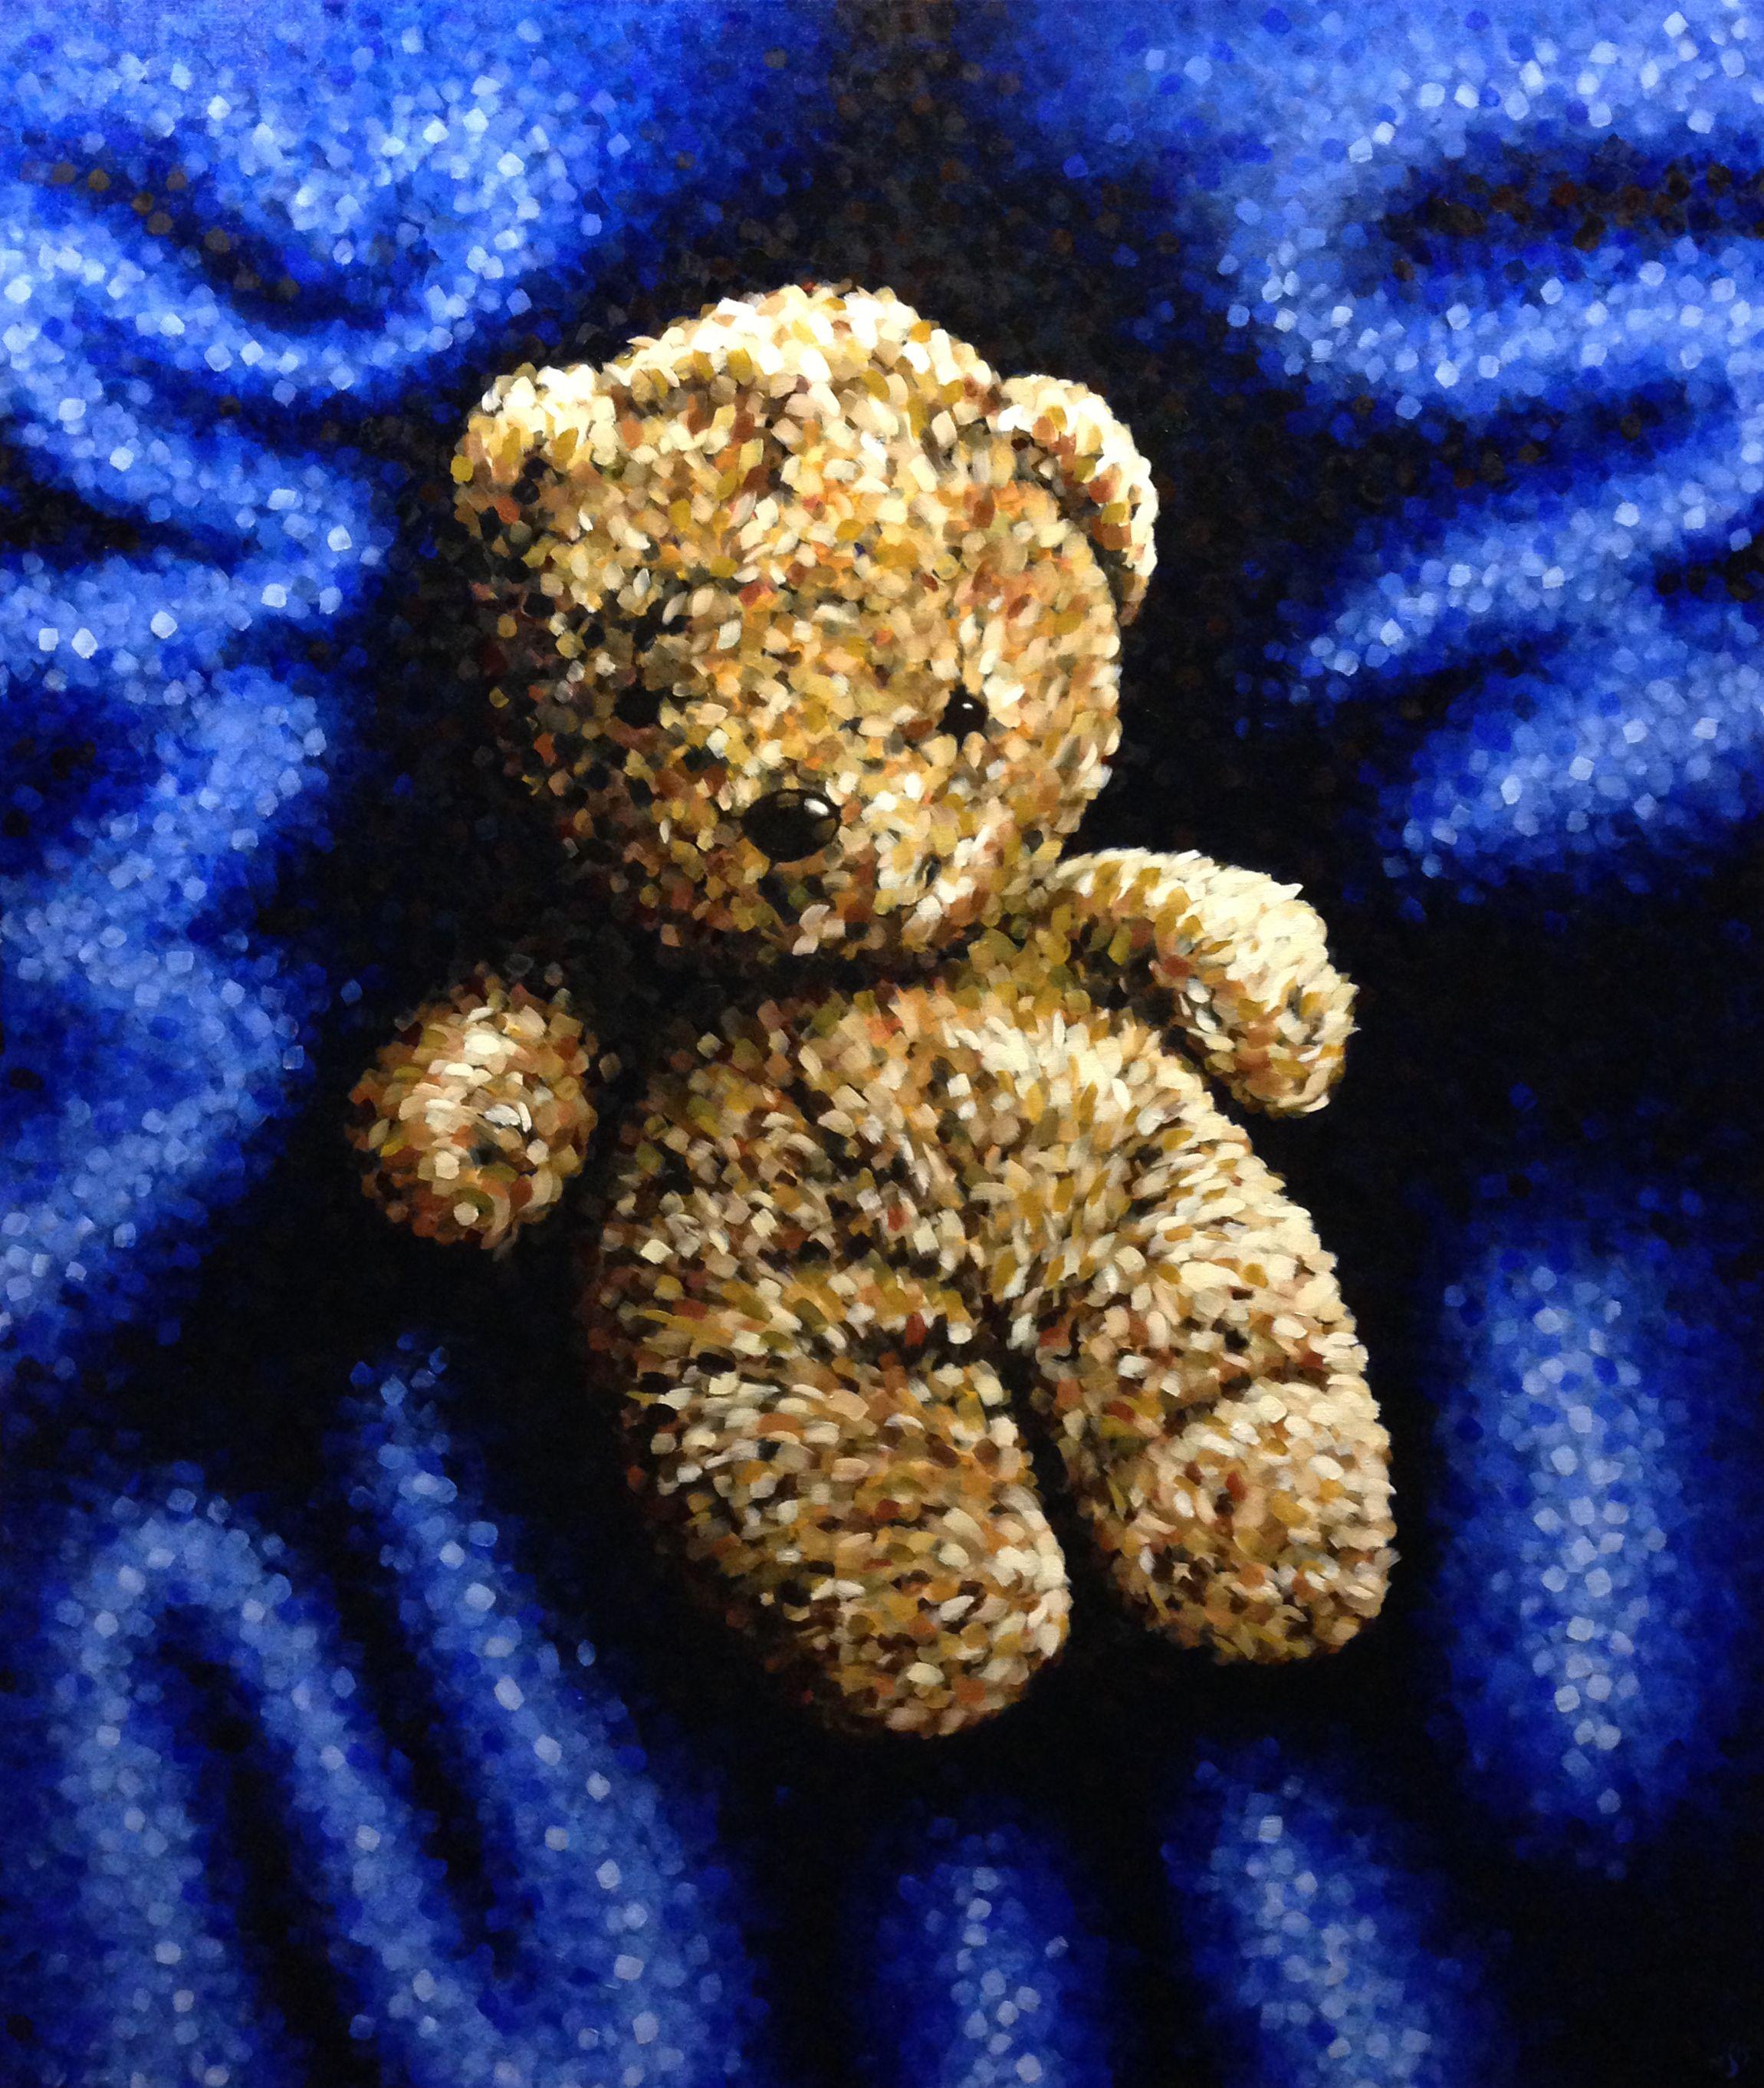 Teddy Bear, 120x100cm, oil on canvas - www.marcelstraver.nl